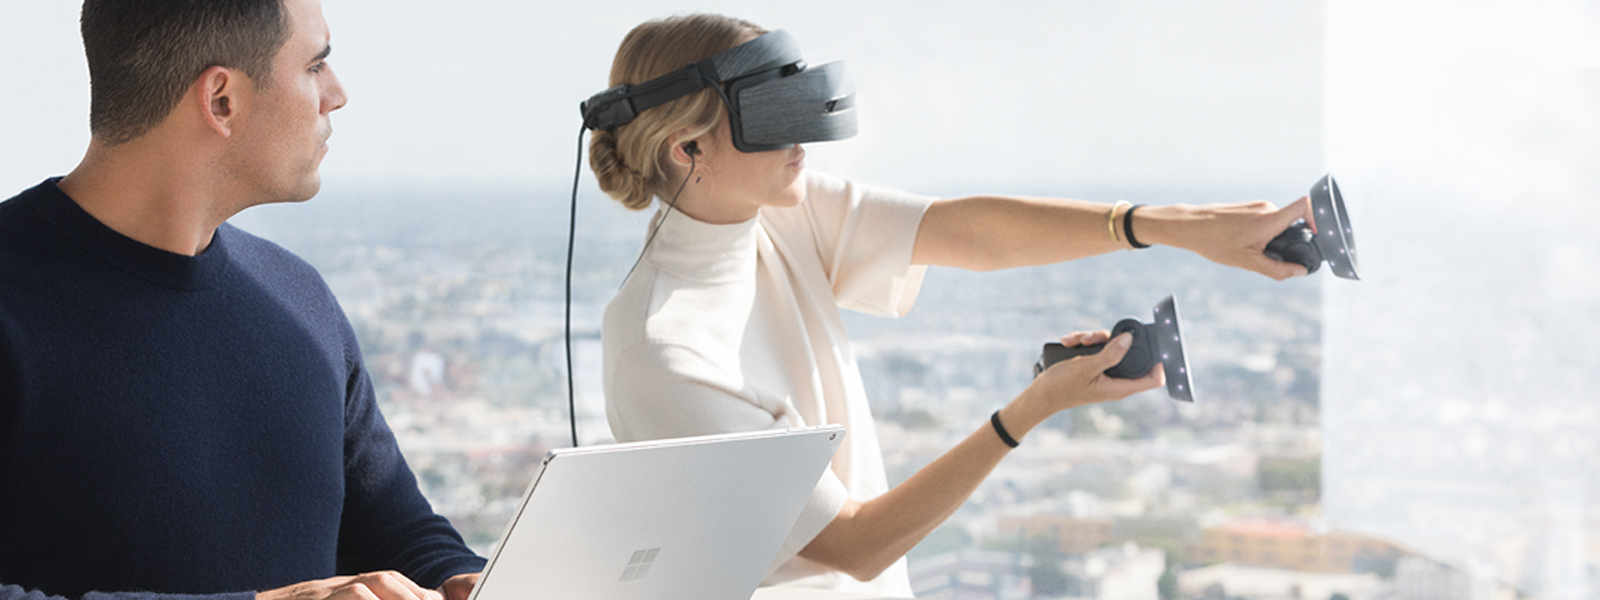 Windows Mixed Reality ヘッドセットとモーション コント ローラーを使用する女性